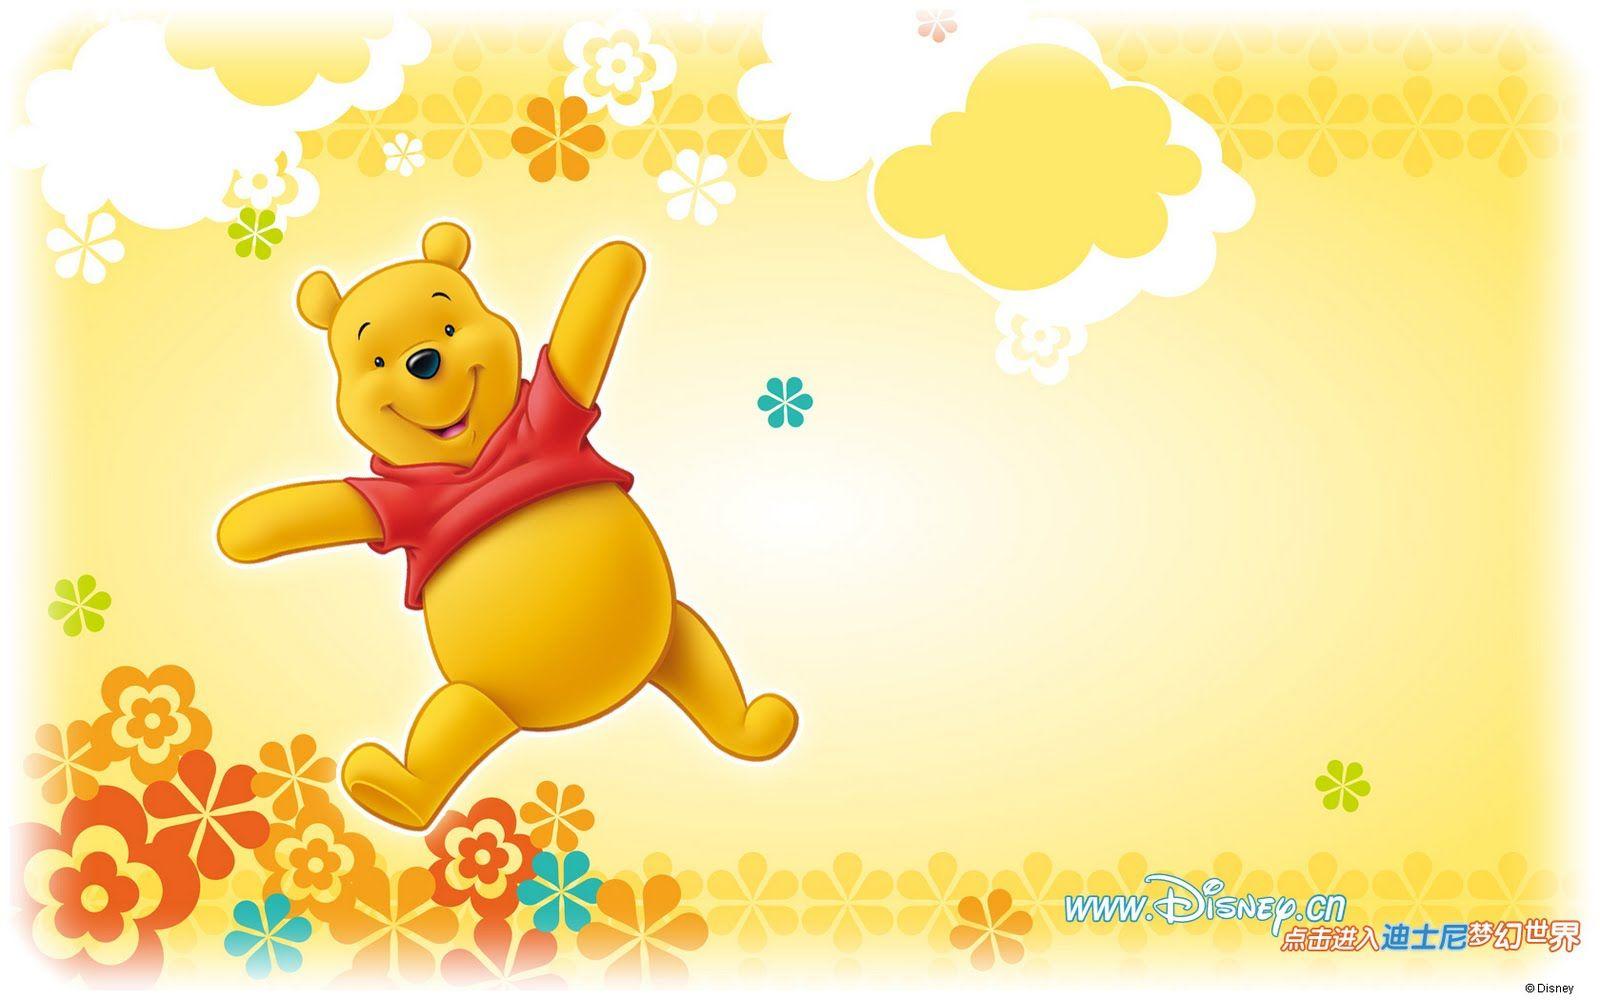 Disneys Winnie The Pooh Imágenes De Disney Winnie Pooh